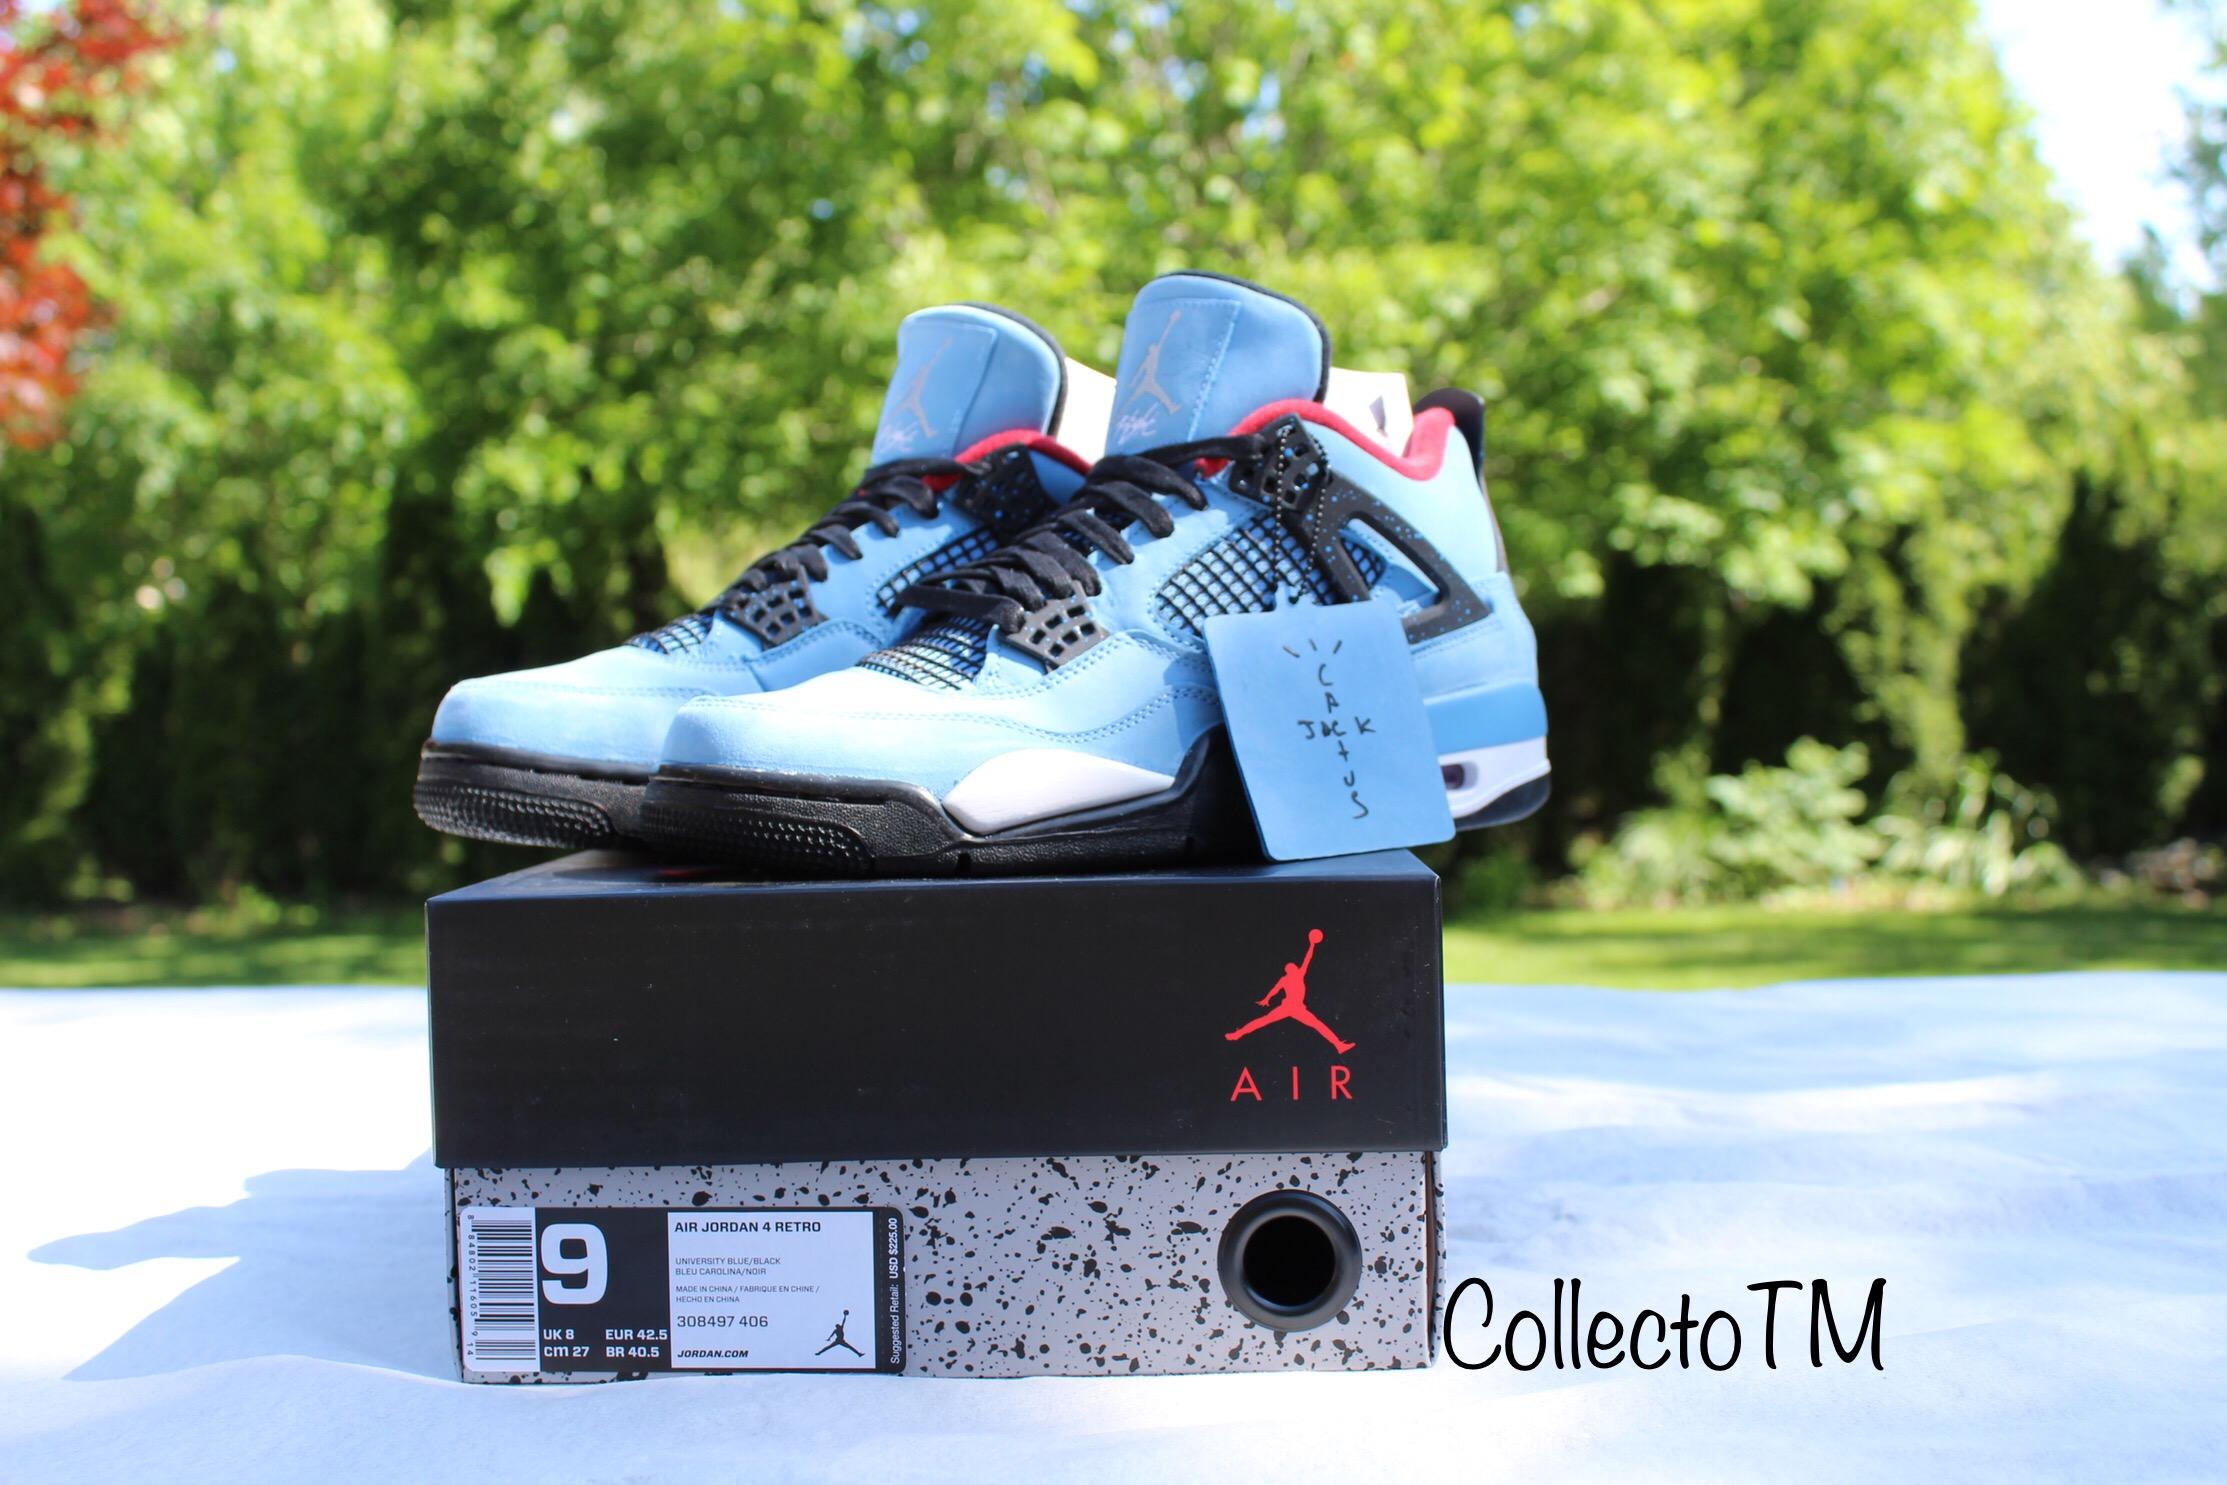 meilleures baskets 2608b fe8d2 Air Jordan Retro 4 X Cactus Jack